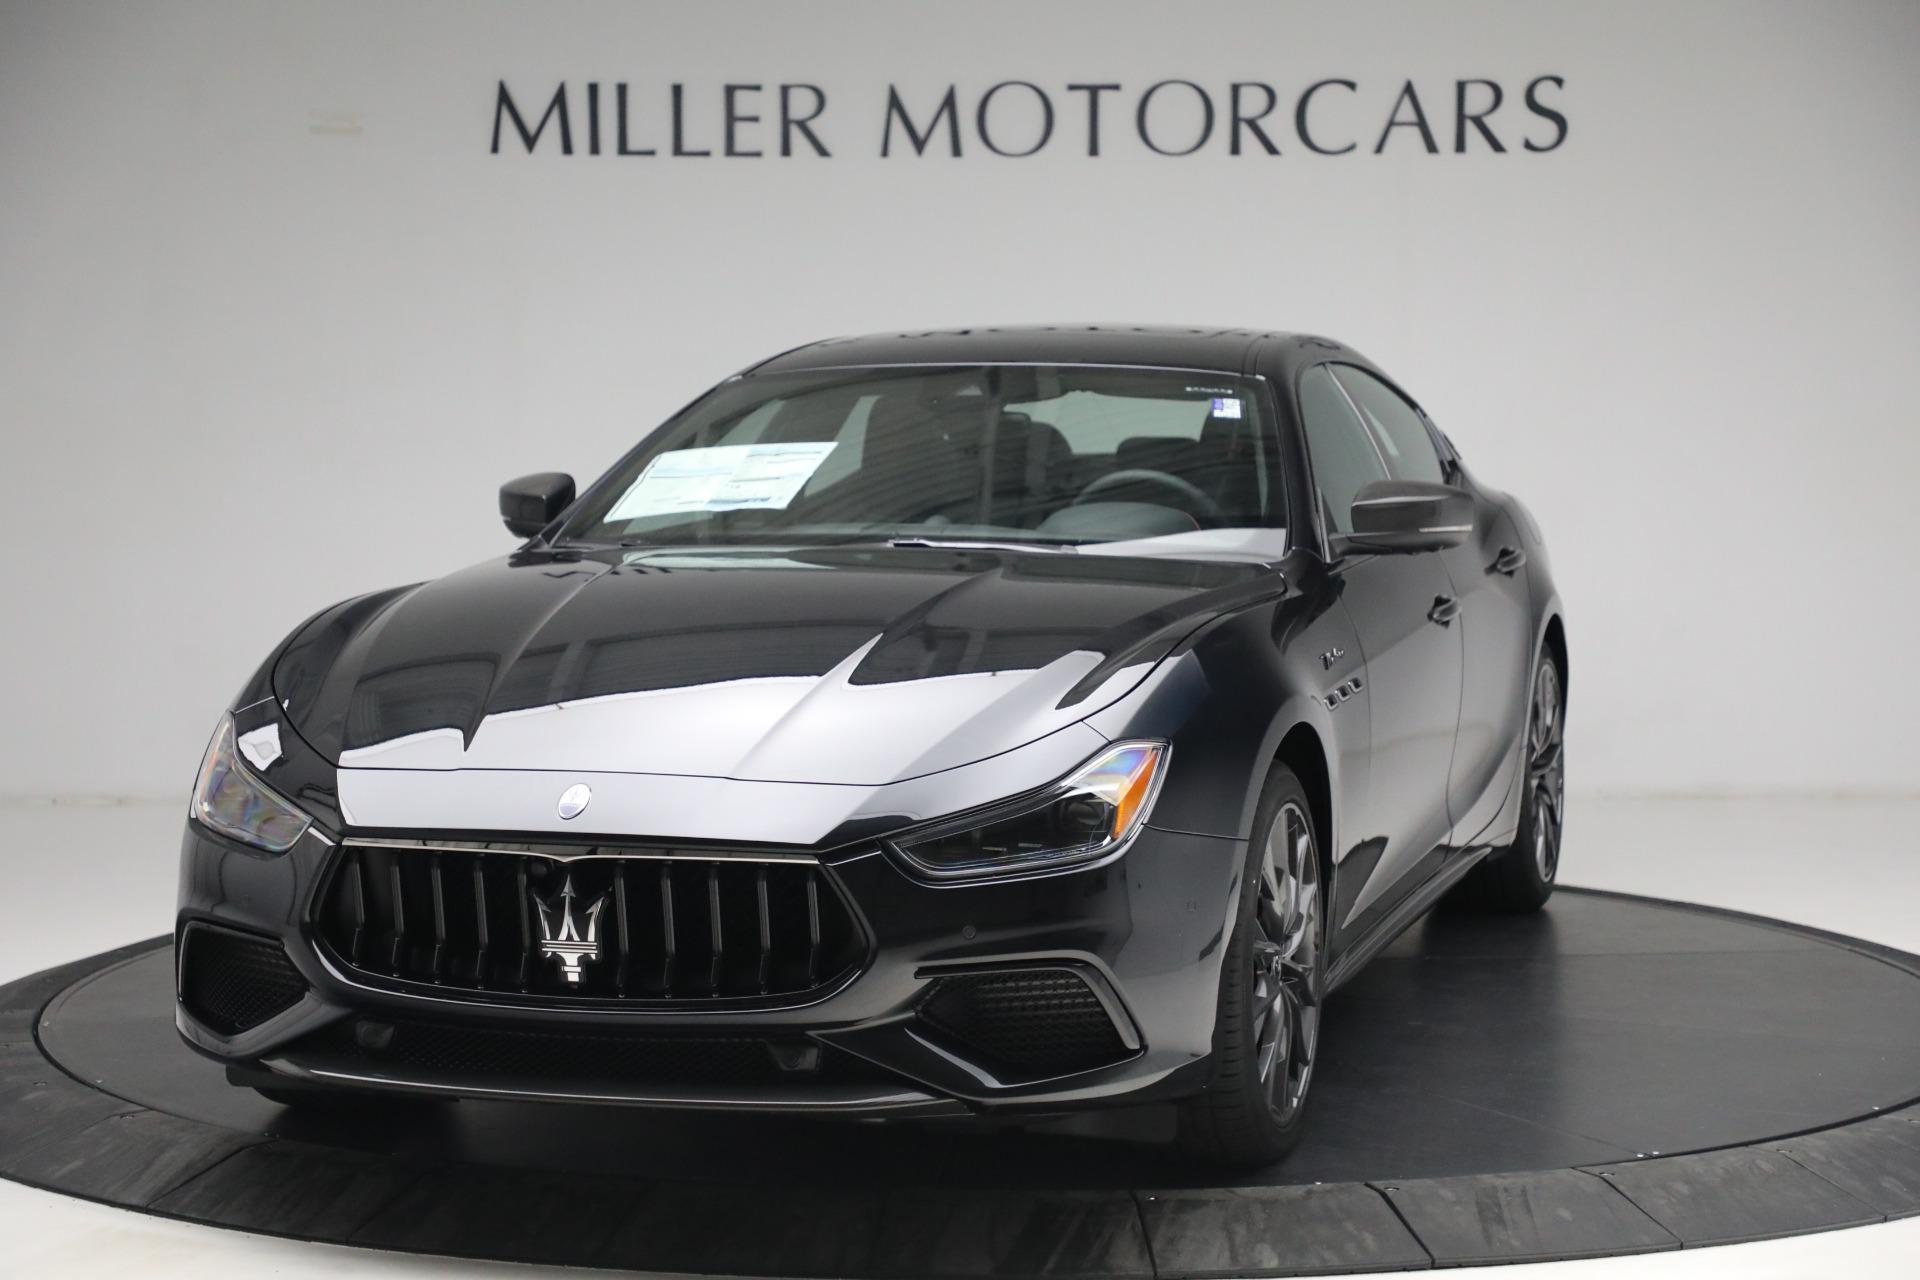 New 2022 Maserati Ghibli Modena Q4 for sale $103,855 at Bentley Greenwich in Greenwich CT 06830 1